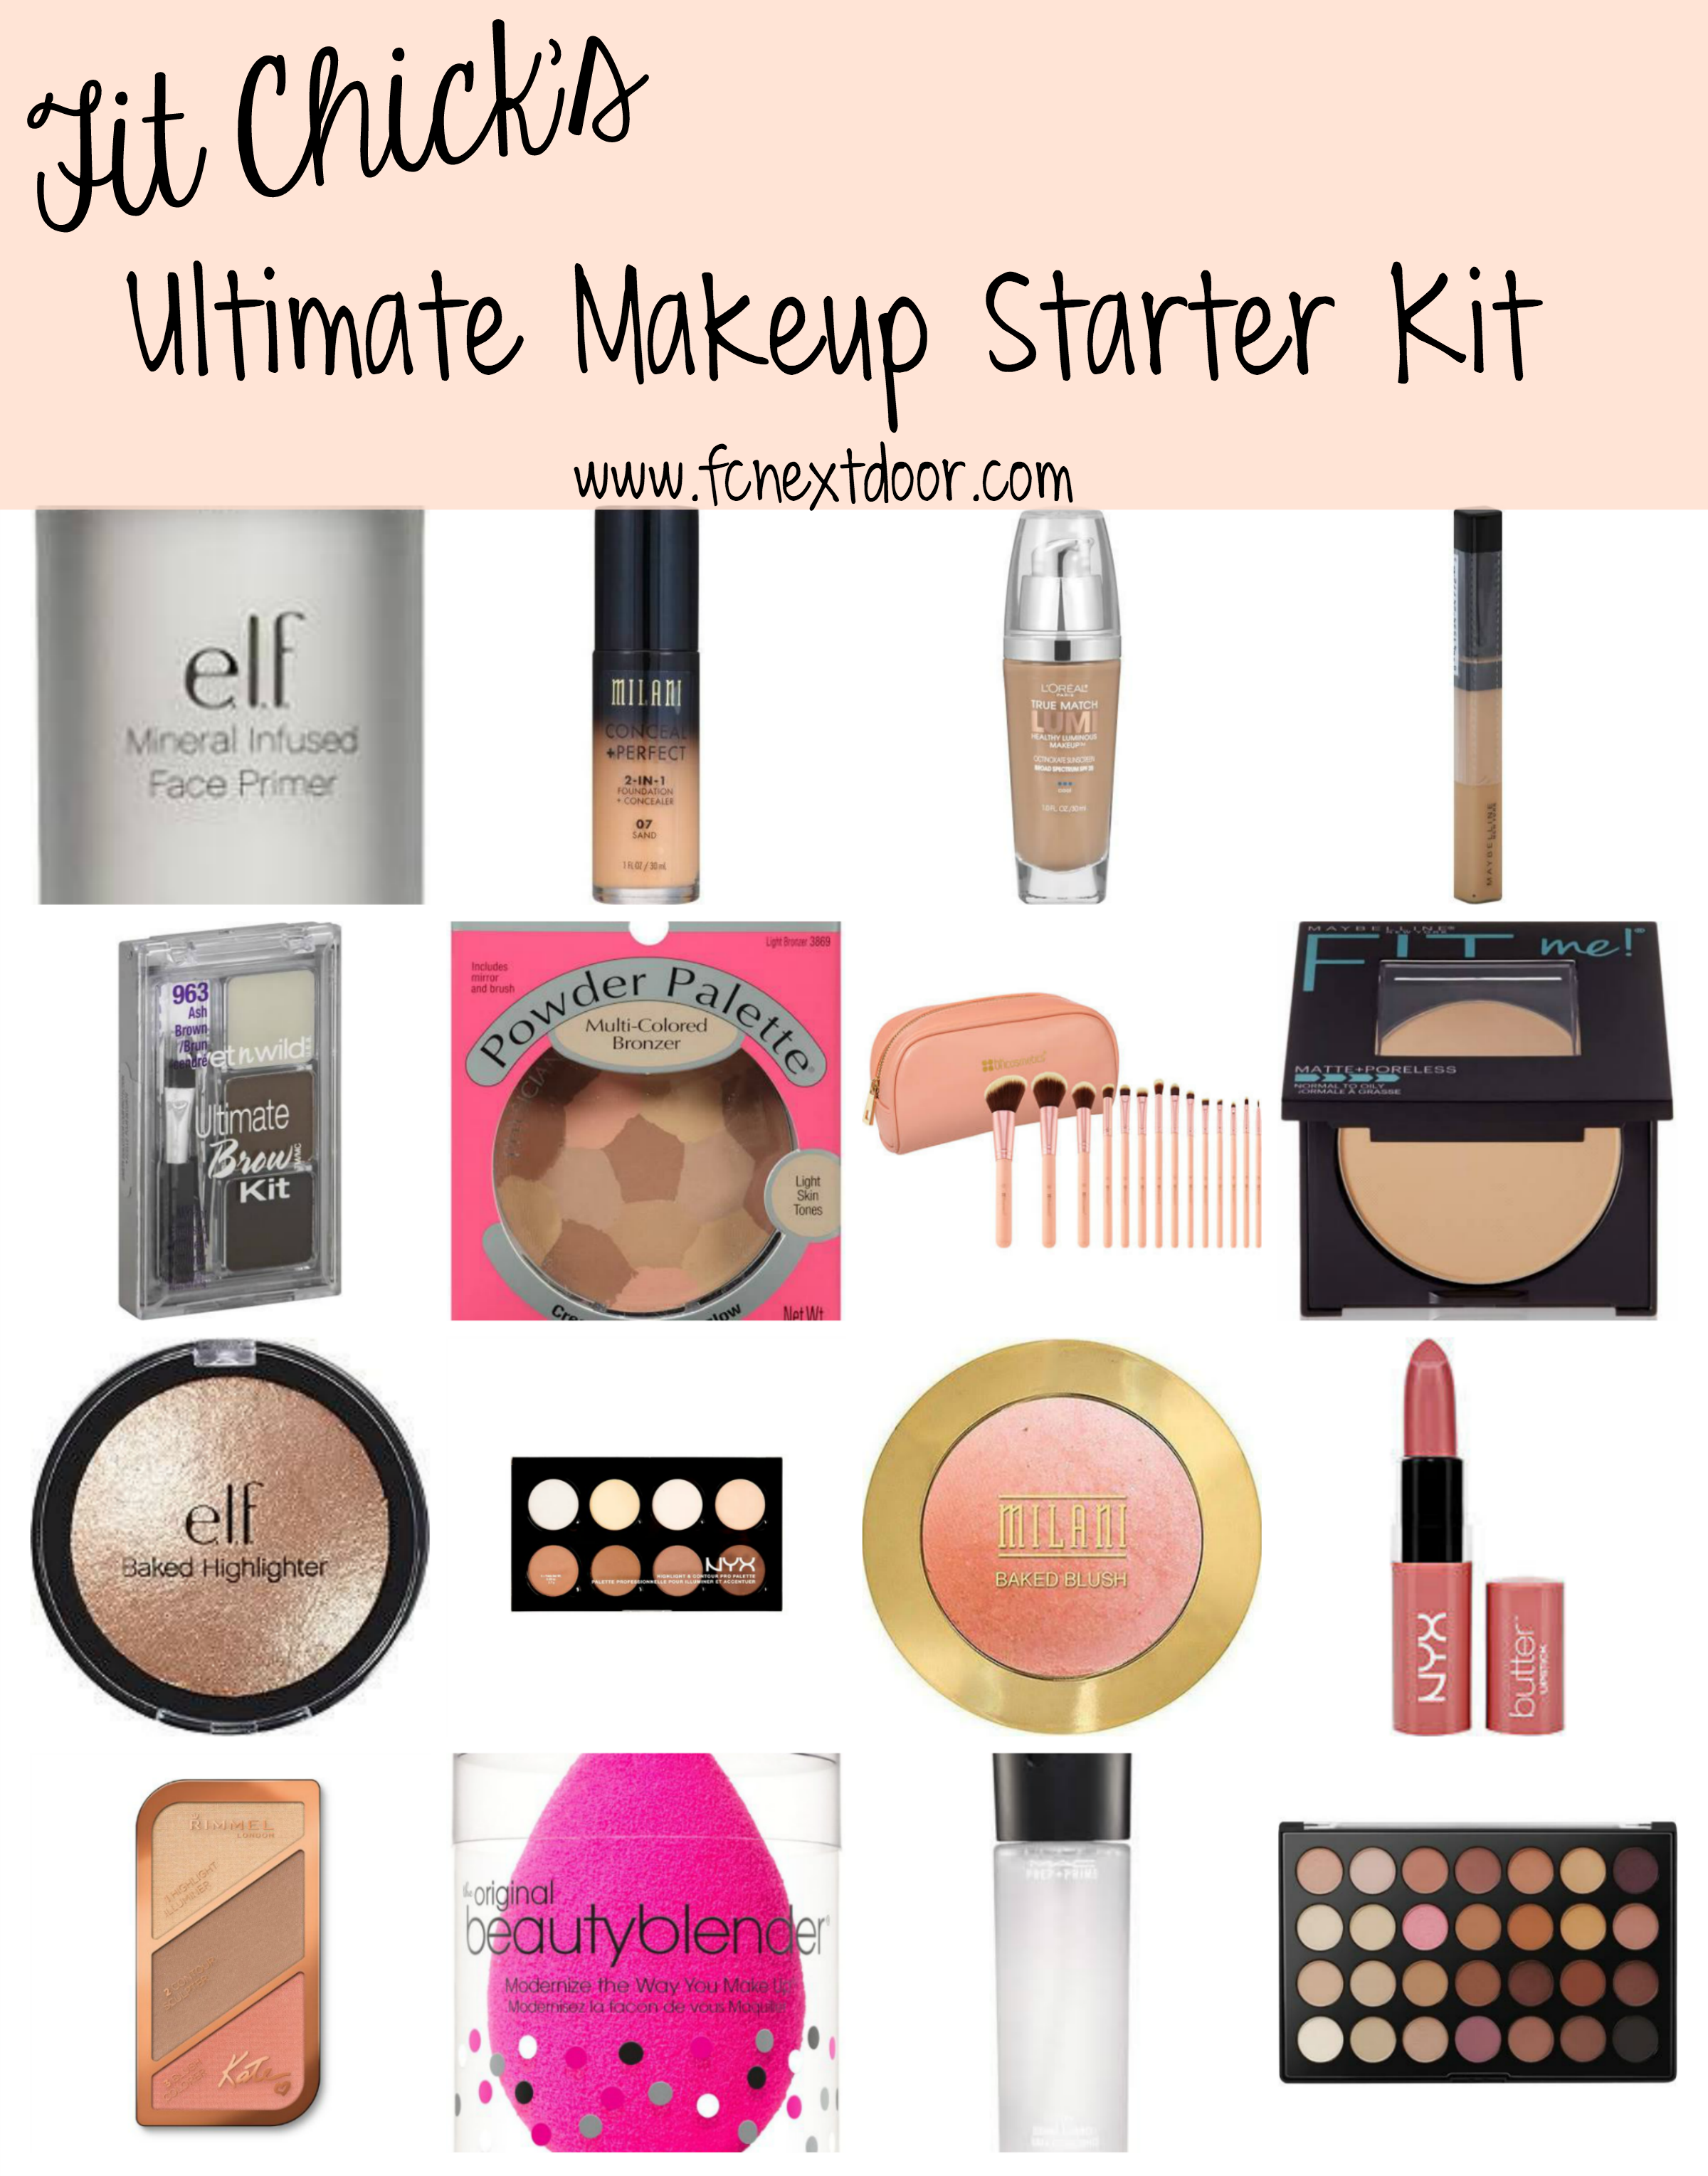 Skin Care Tips For Beautiful Skin Makeup starter kit